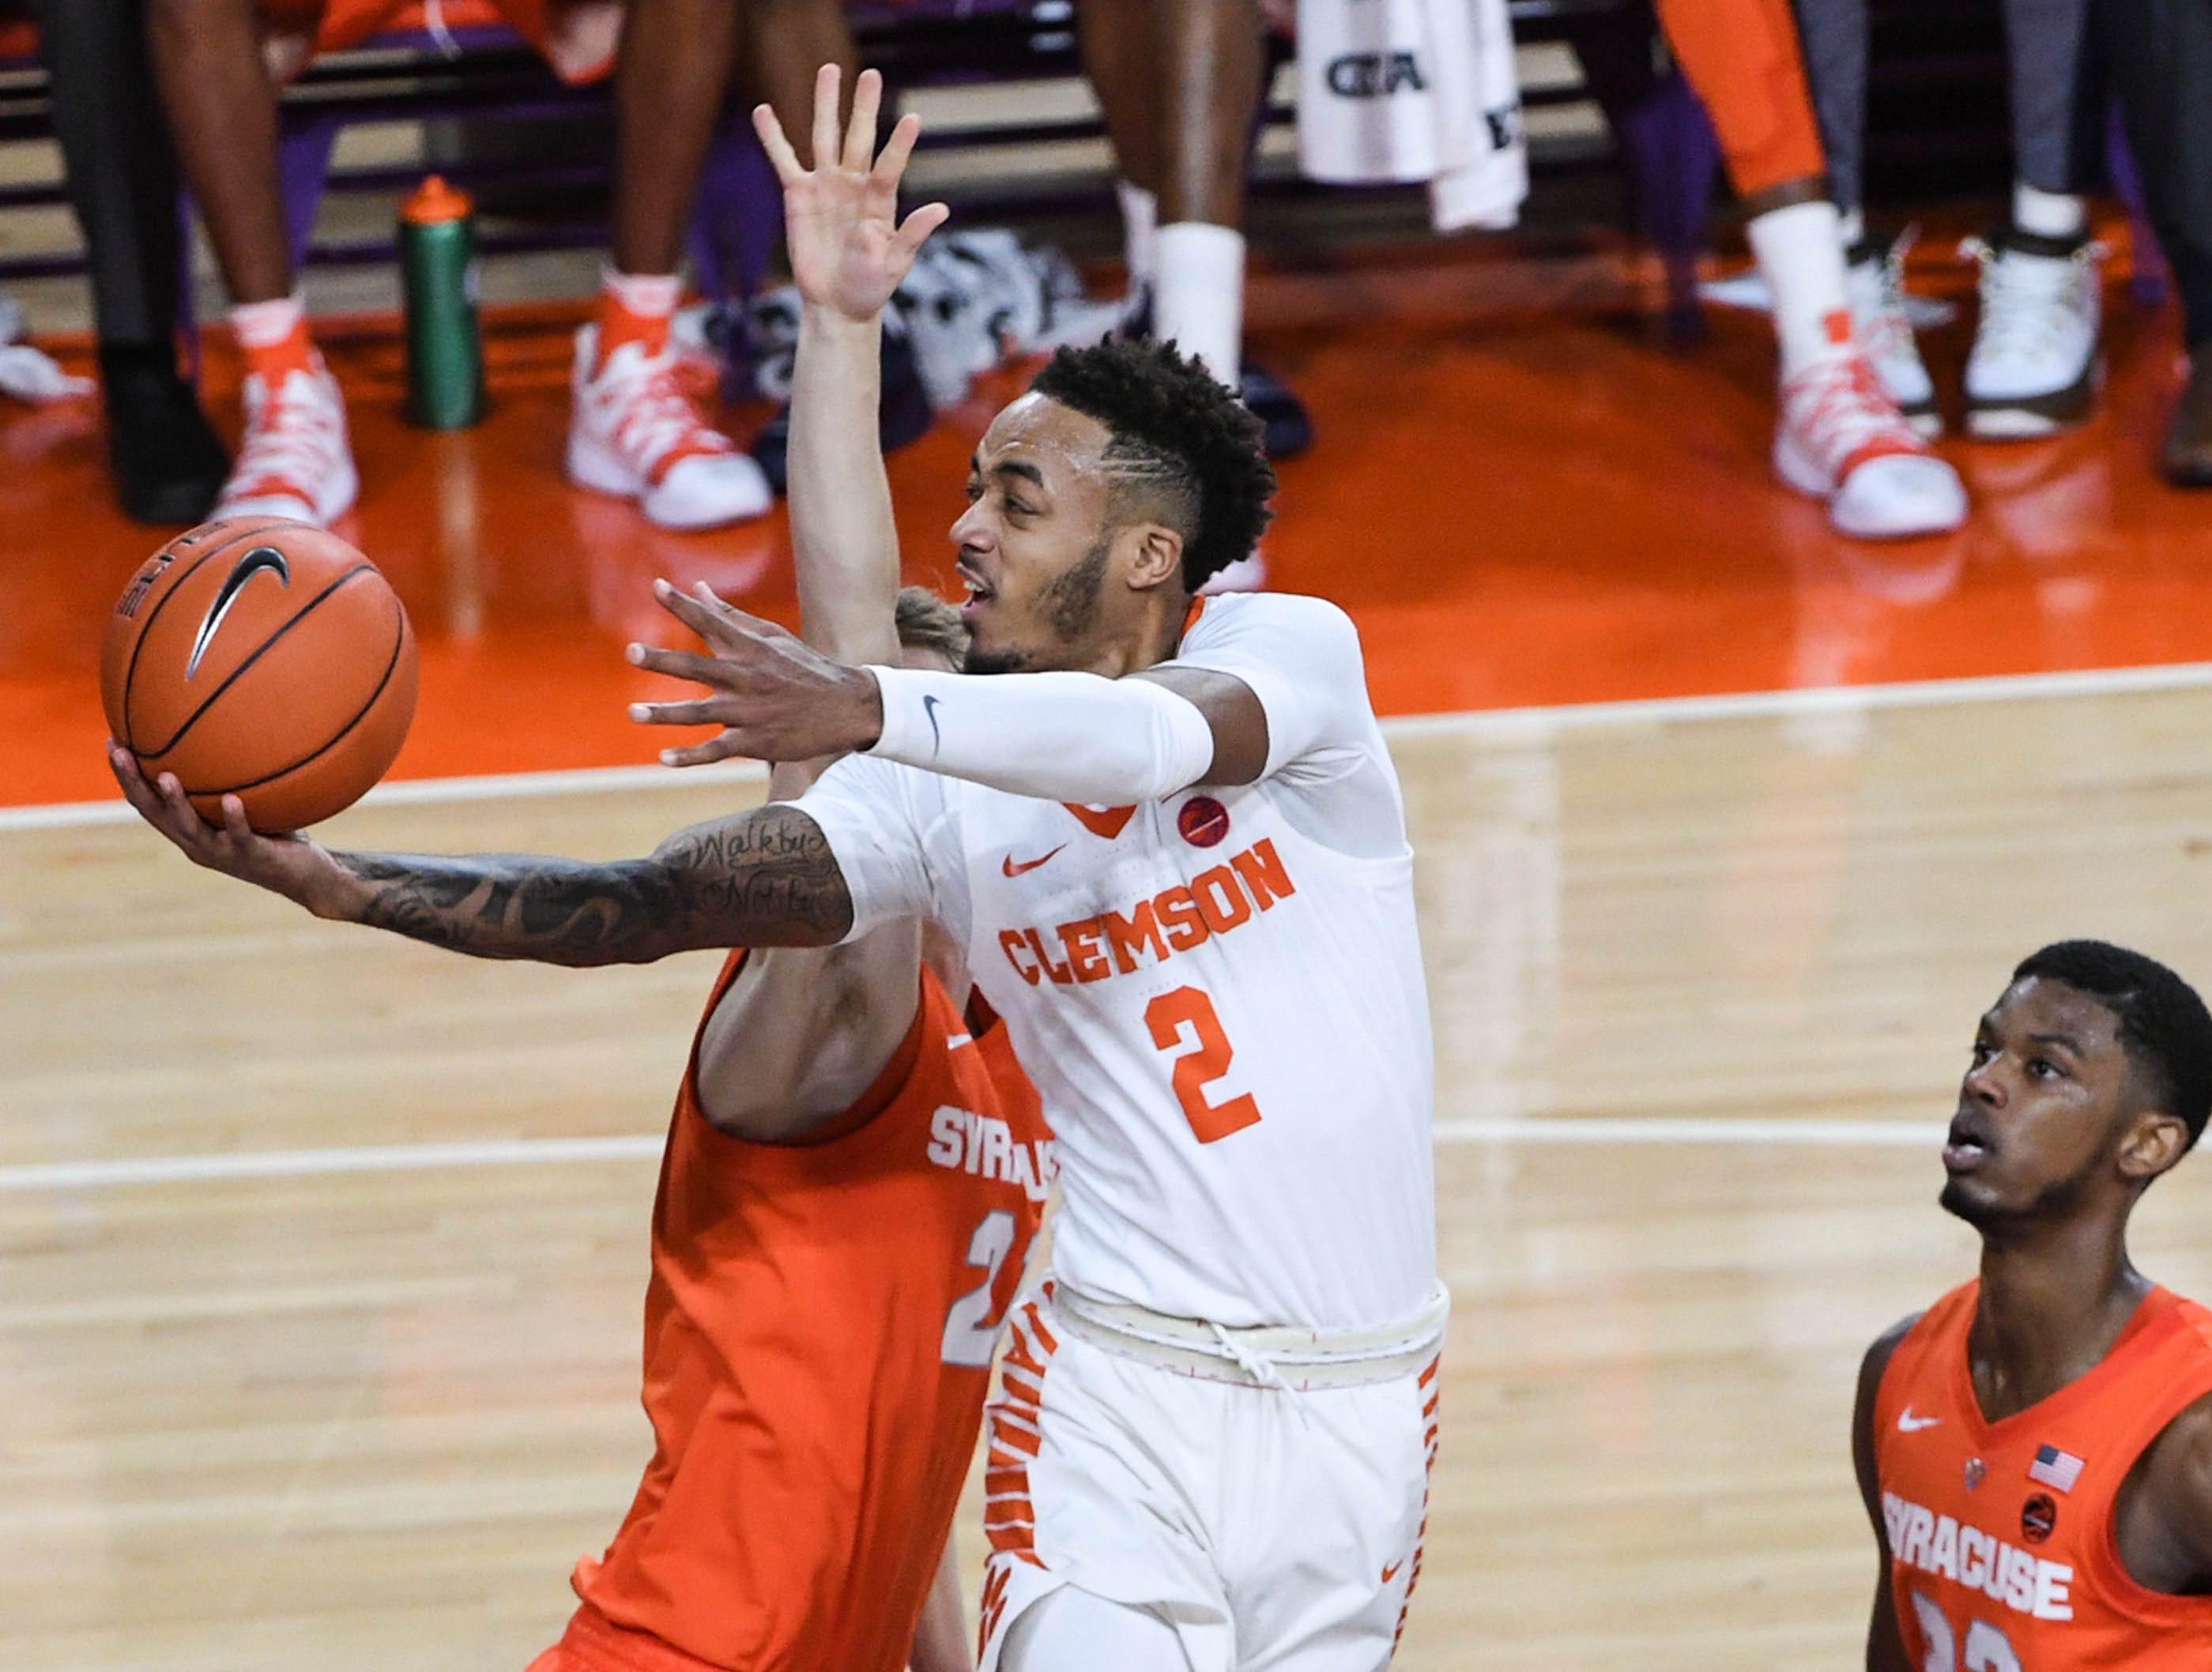 Clemson guard Marcquise Reed (2) shoots near Syracuse forward Marek Dolezaj(21) during the first half in Littlejohn Coliseum in Clemson Saturday, March 9, 2019.